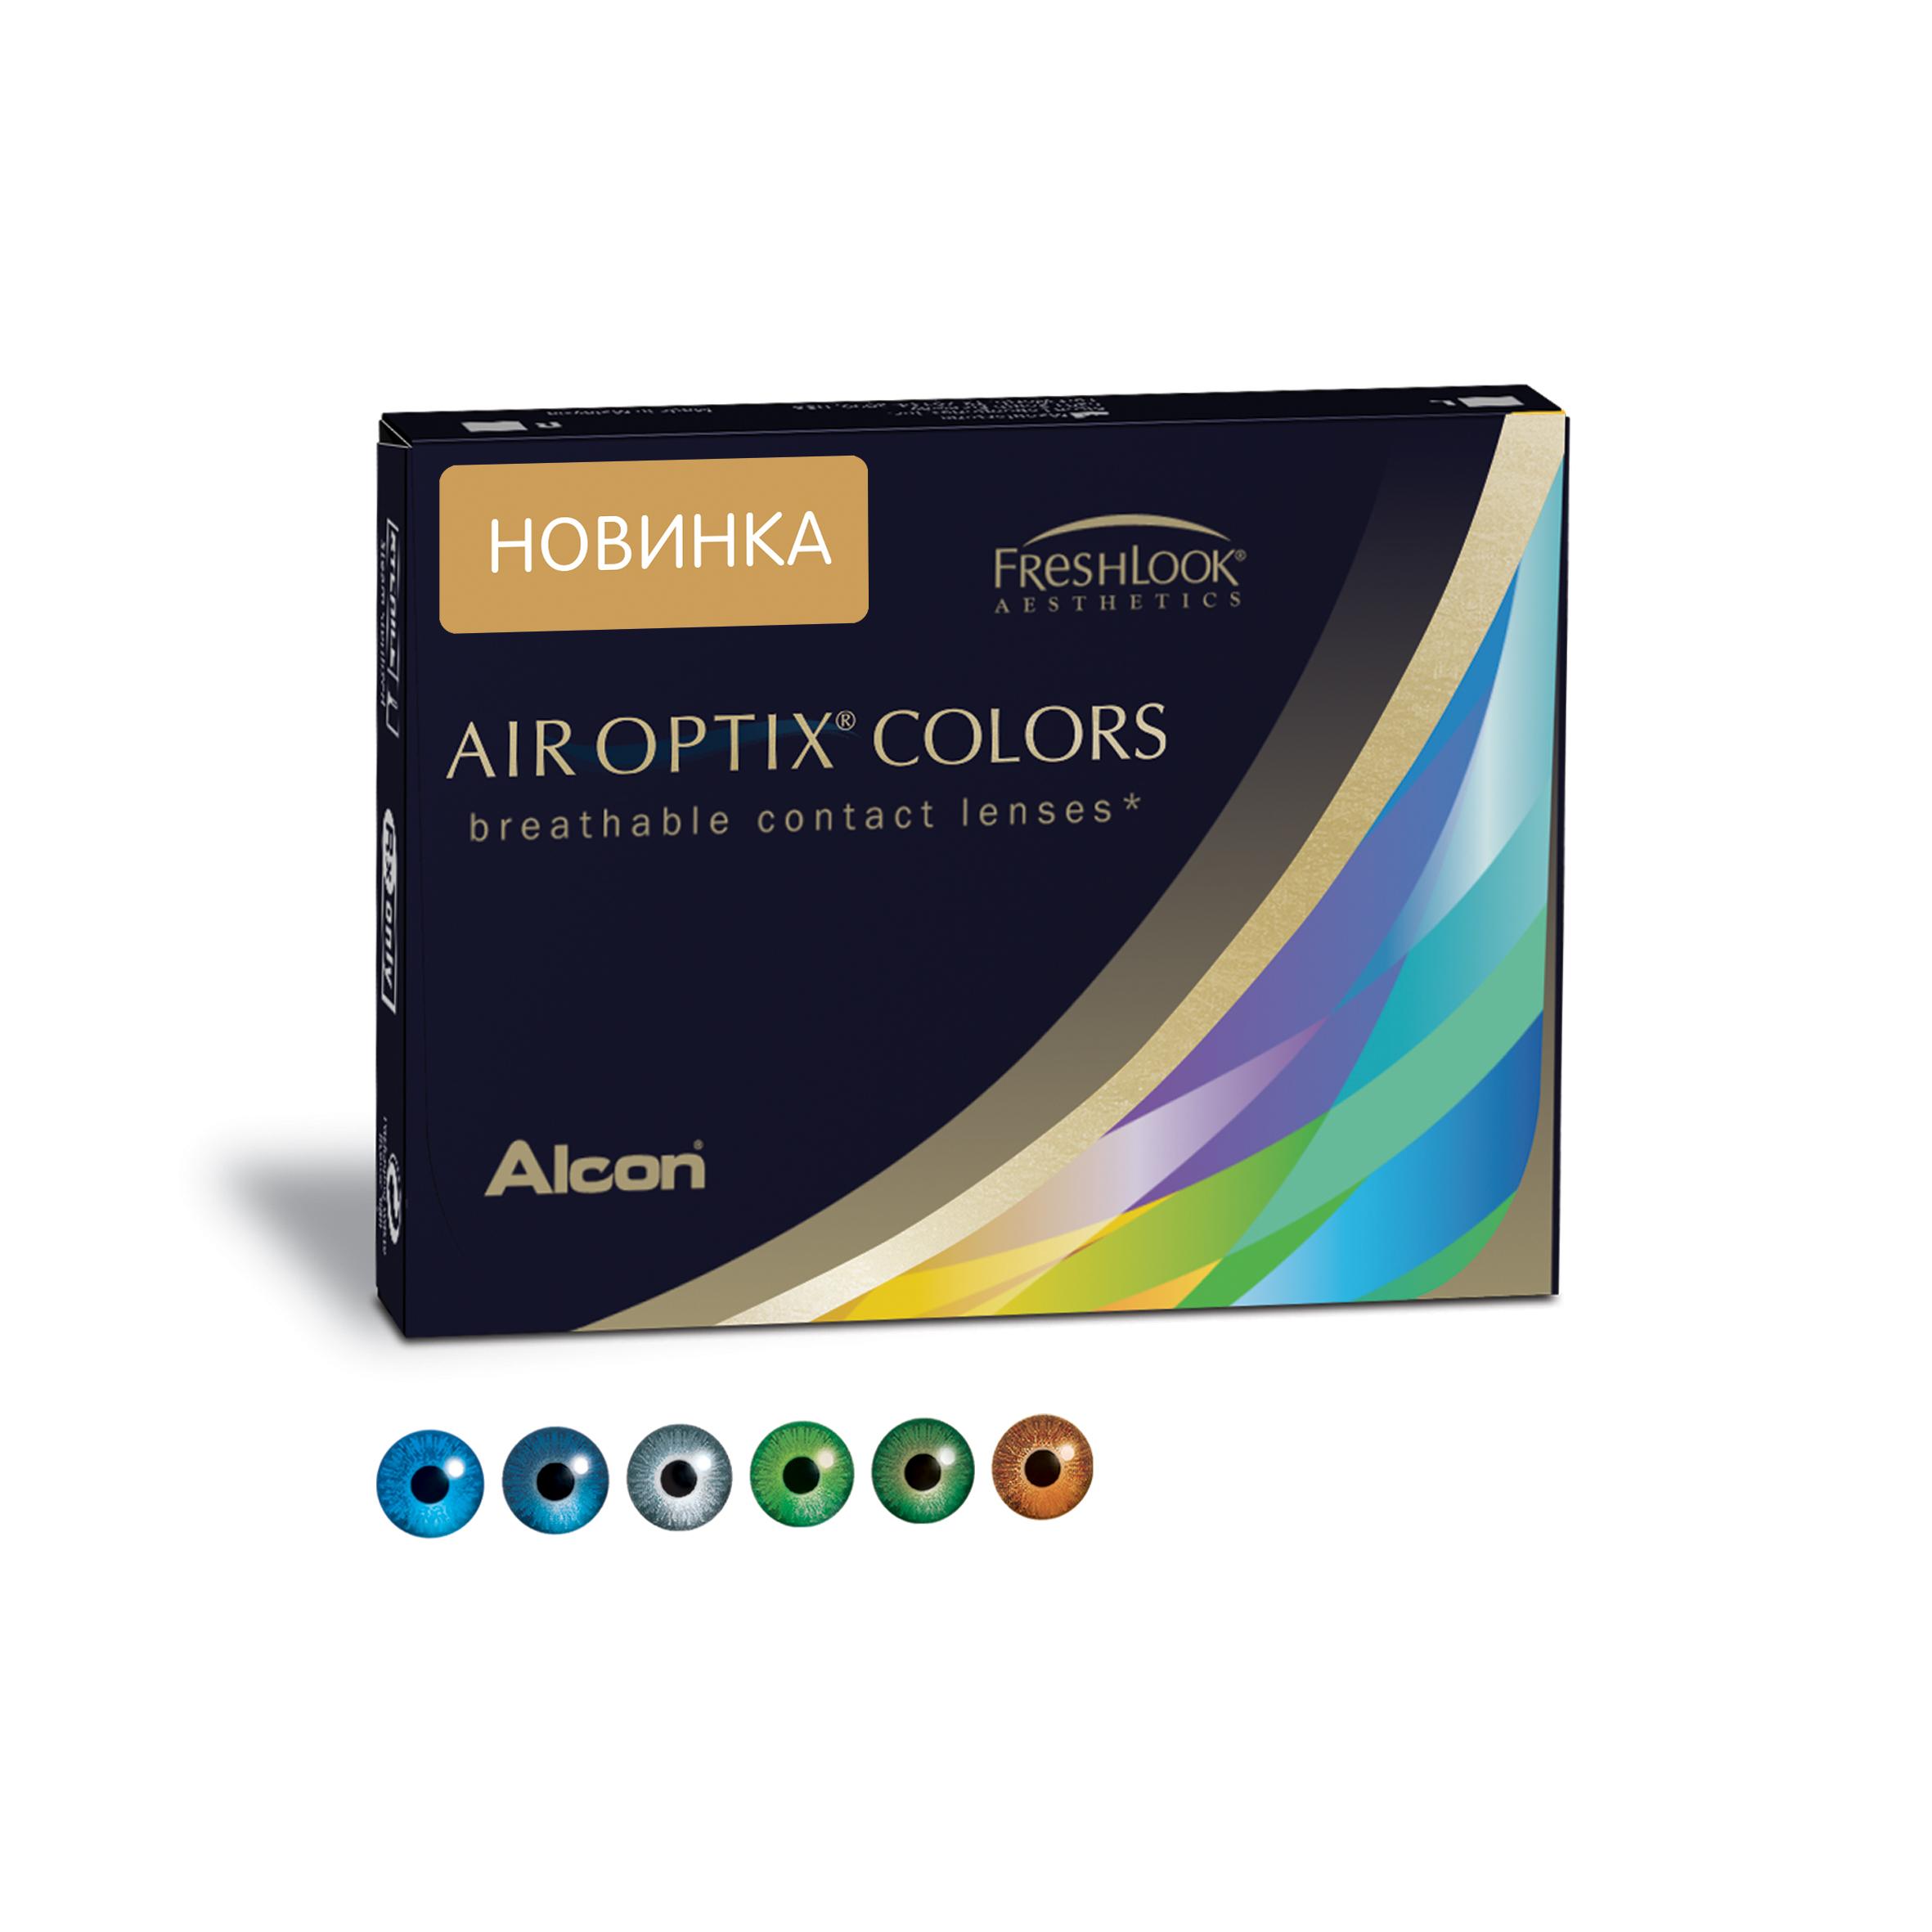 Аlcon контактные линзы Air Optix Colors 2 шт -3.25 Green31746207Мягкие контактные линзы